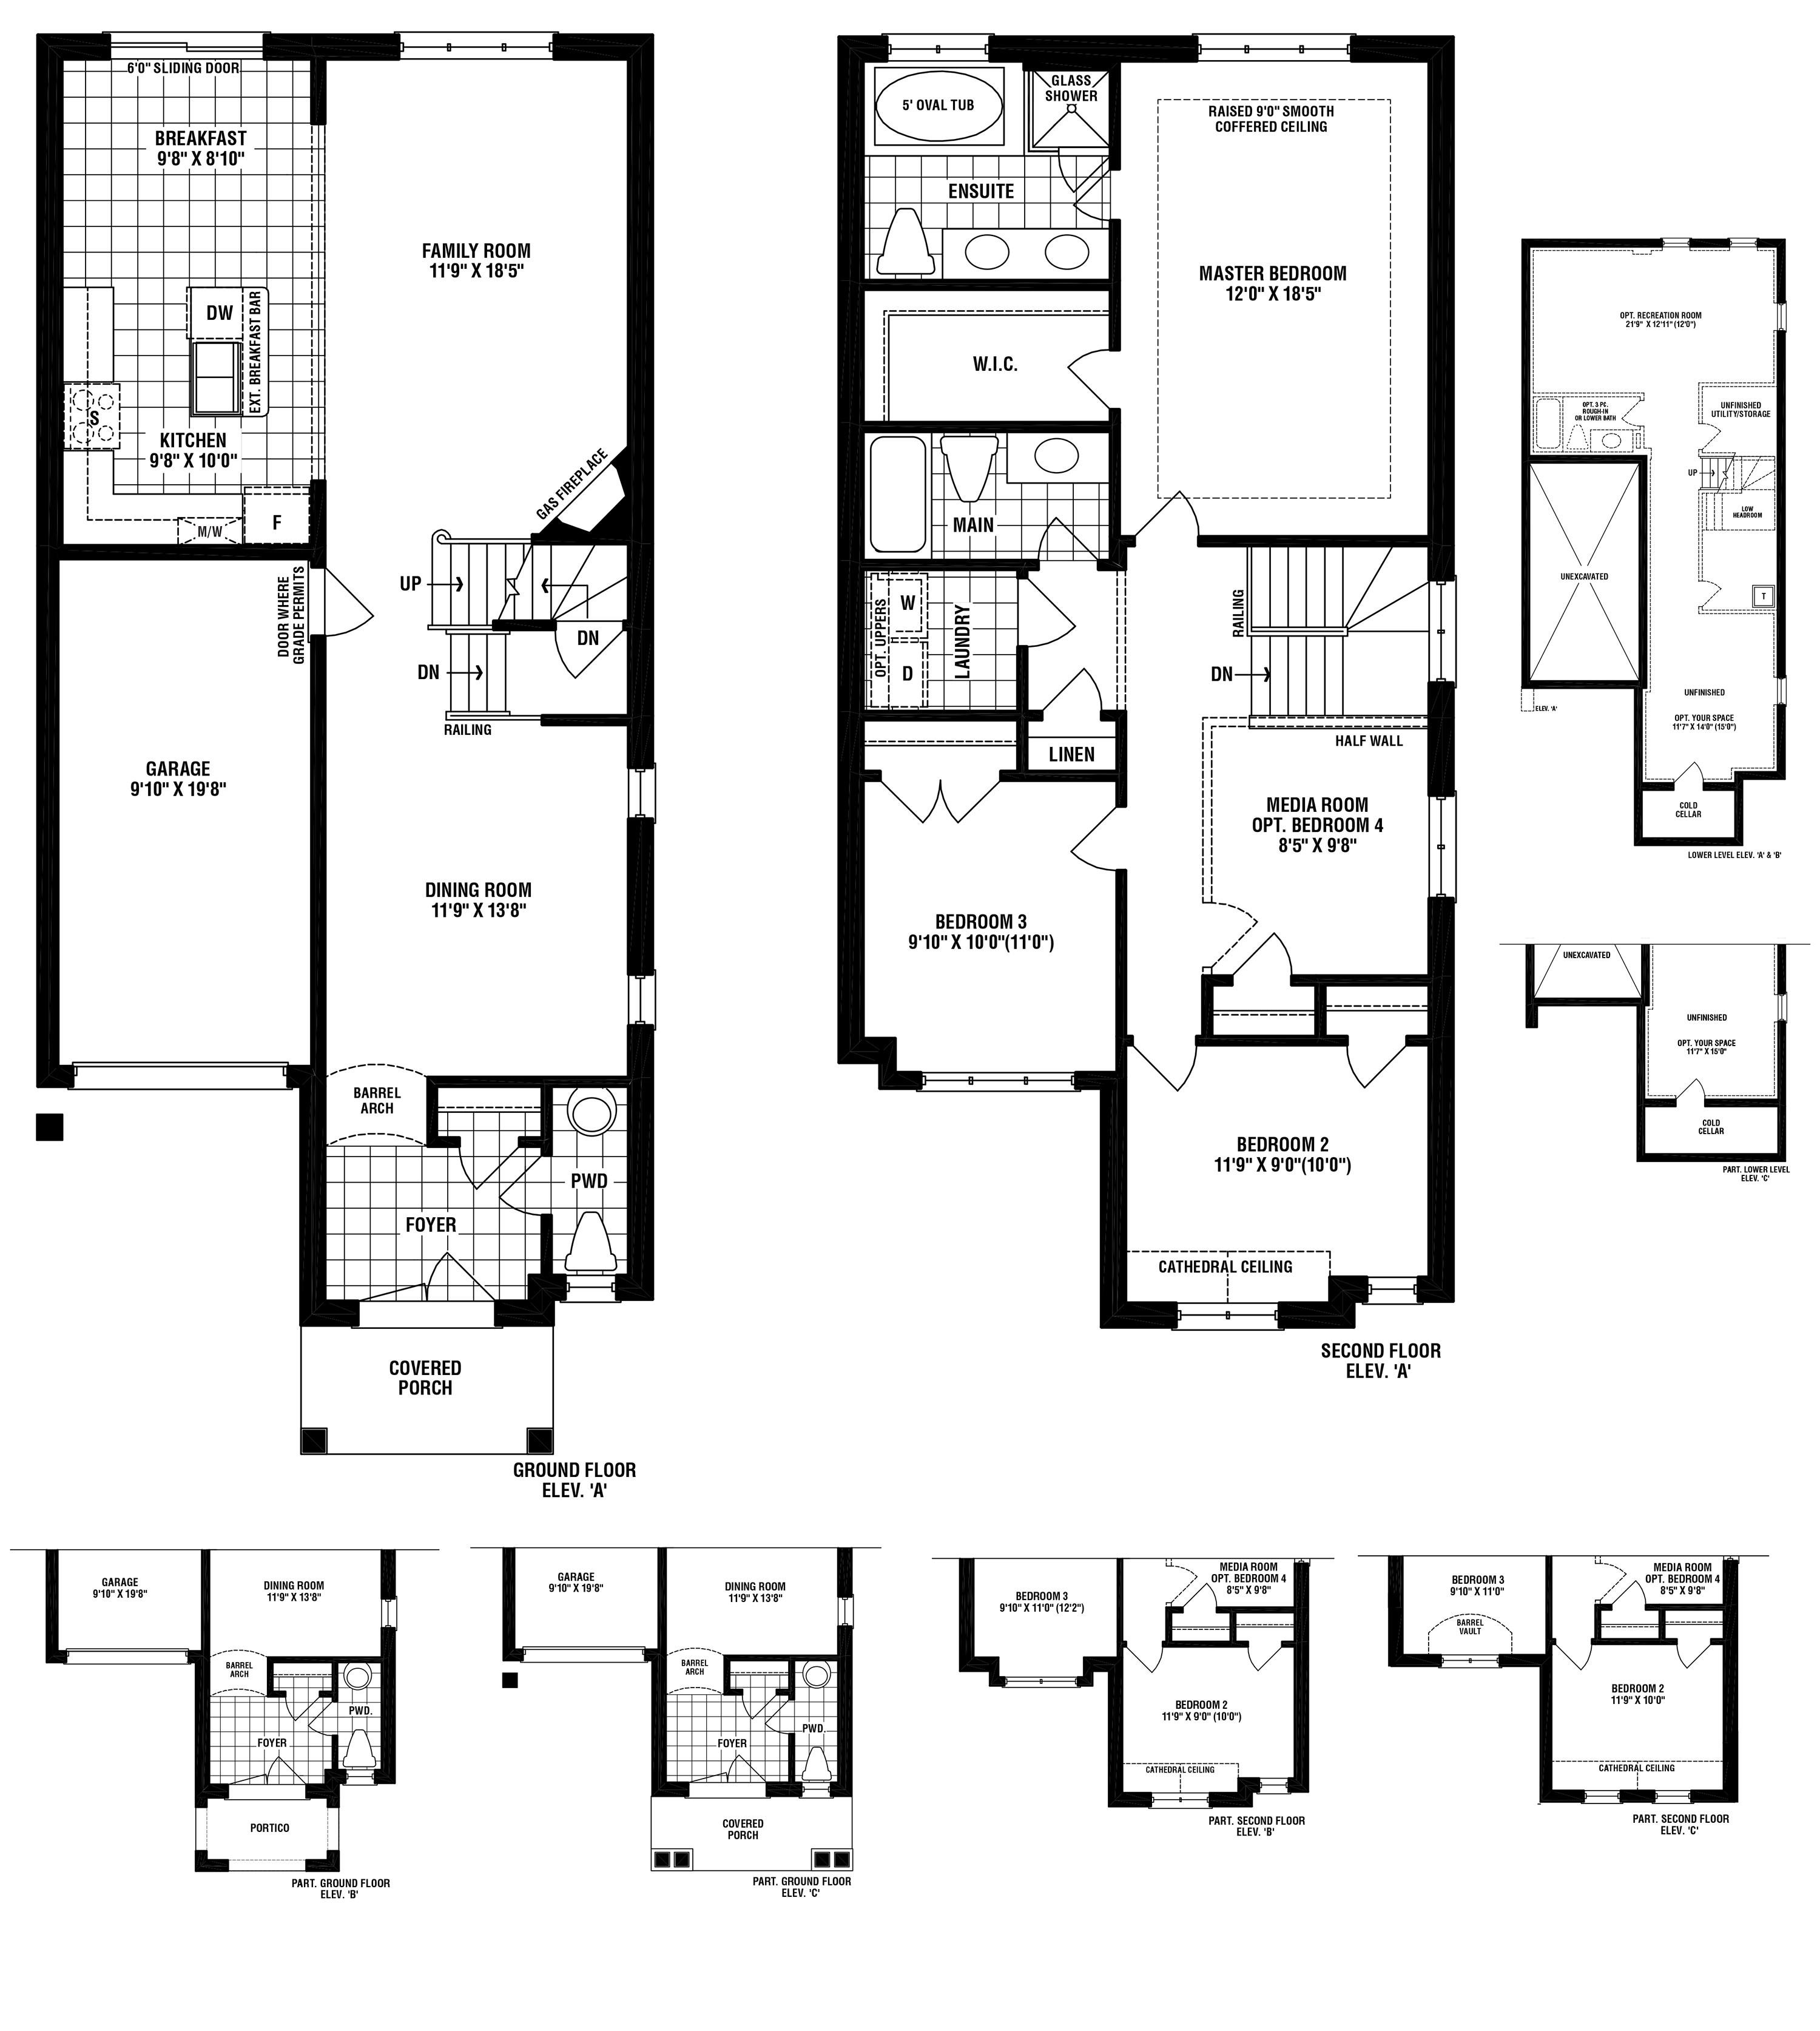 Glenbrook Floorplan